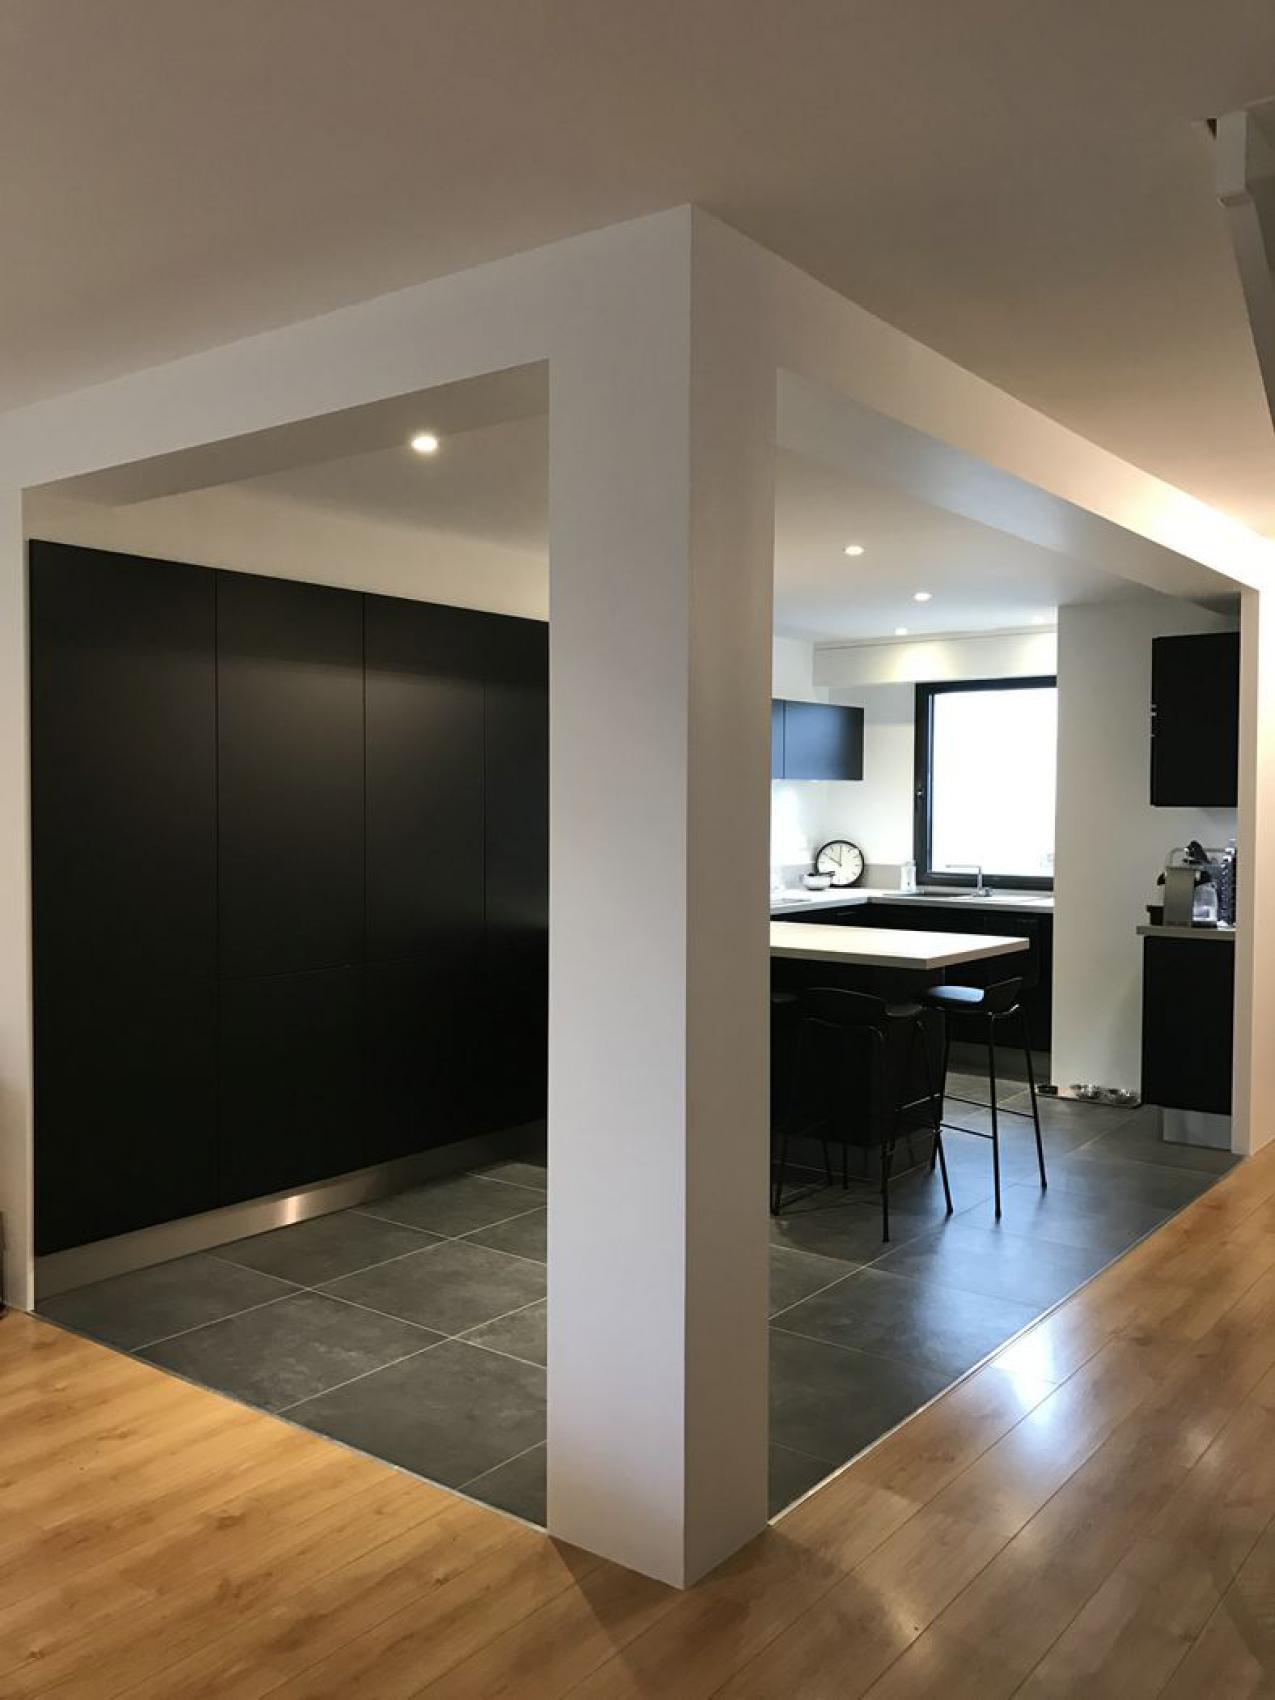 travaux de r novation d 39 une cuisine perigny proche la. Black Bedroom Furniture Sets. Home Design Ideas